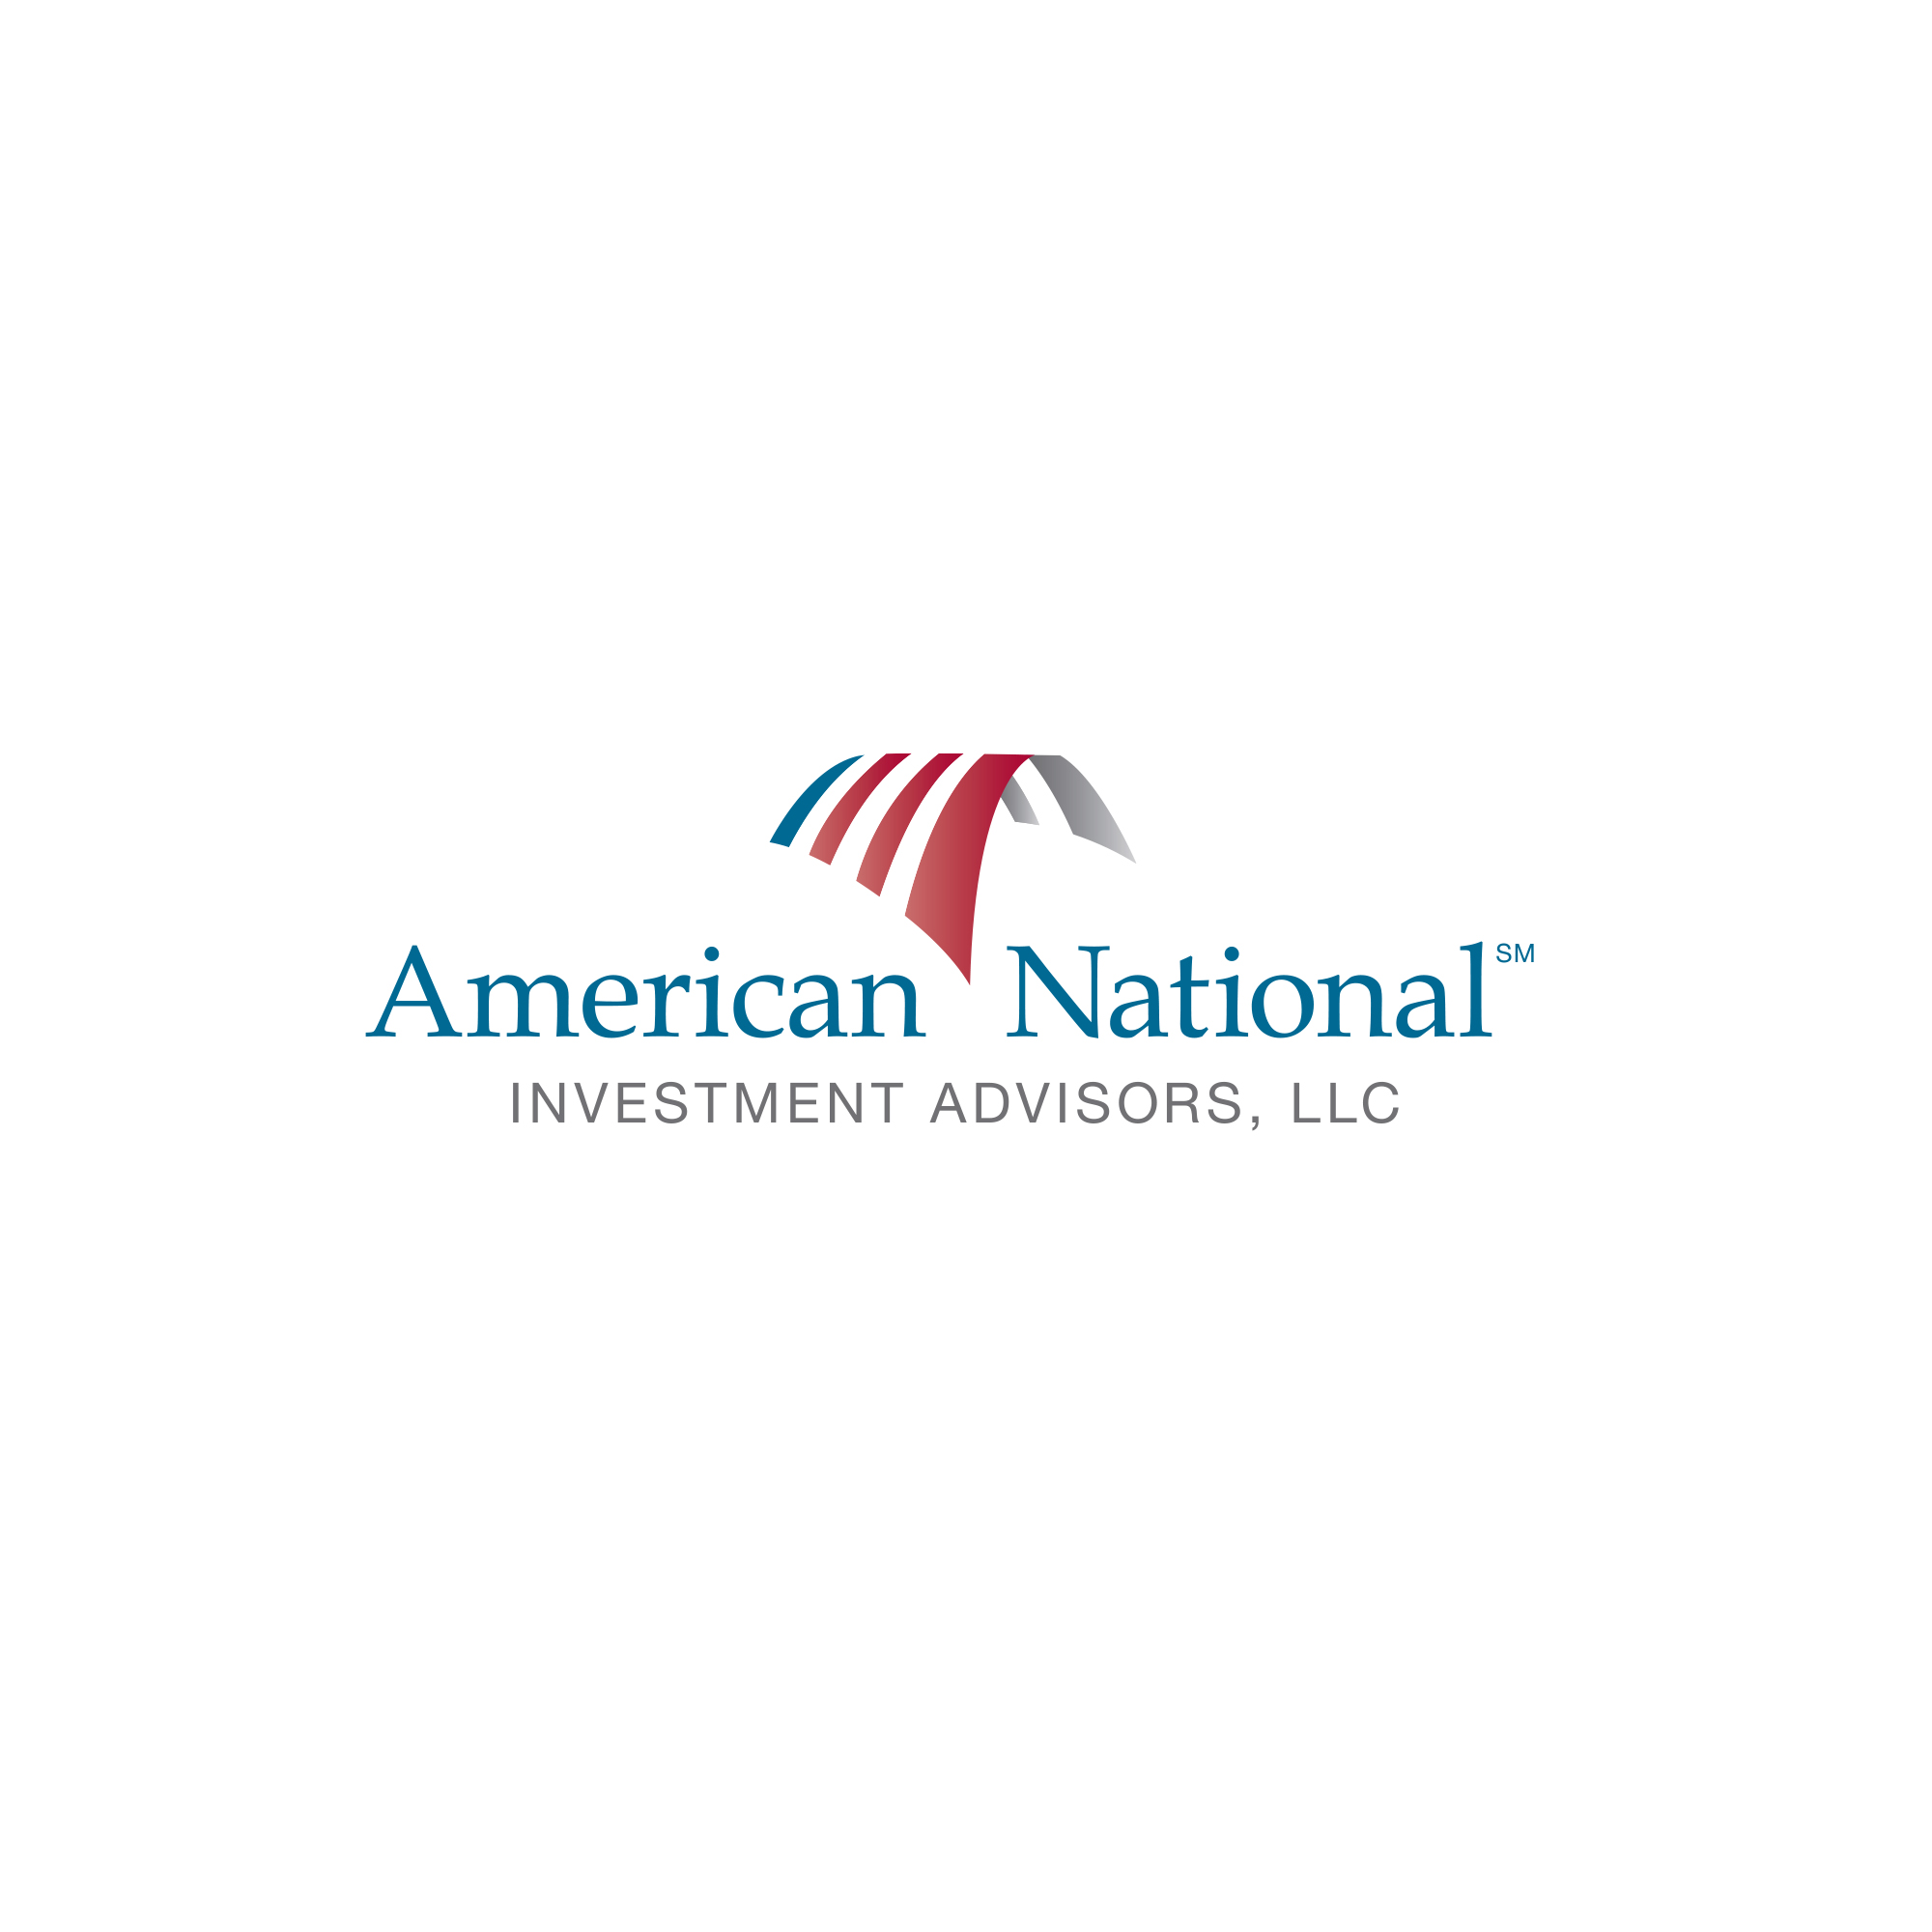 brandmarks_0012_AmericanNational_3C_Logo.jpg